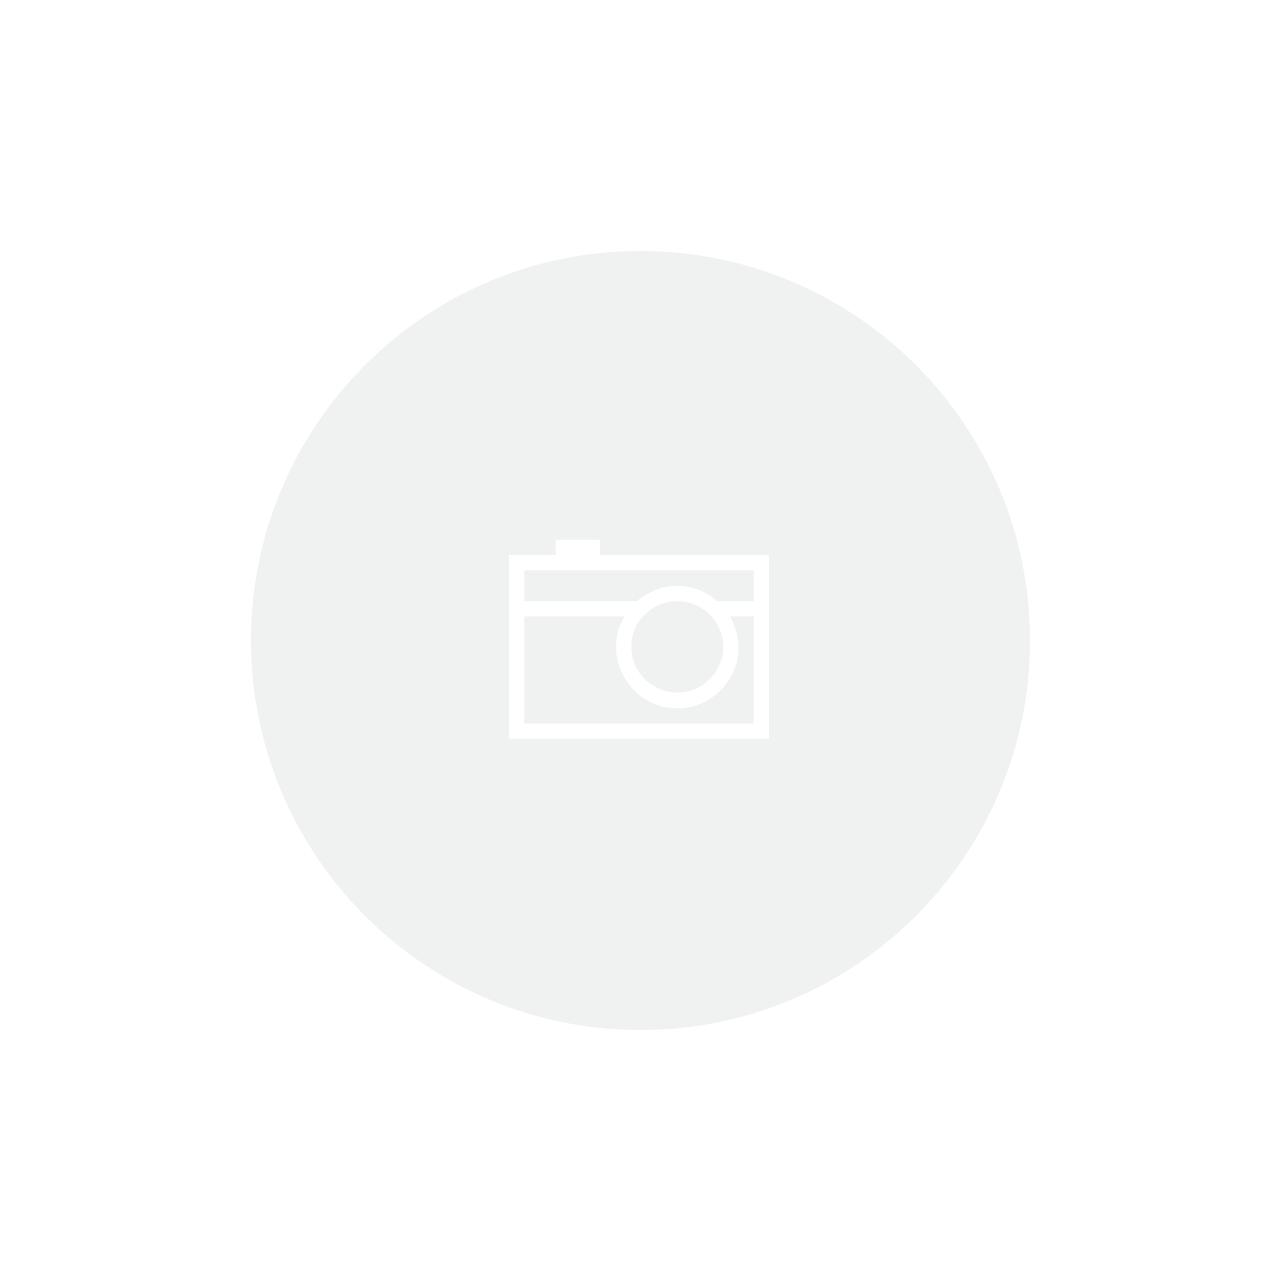 MANGUITO NALINI ARMS